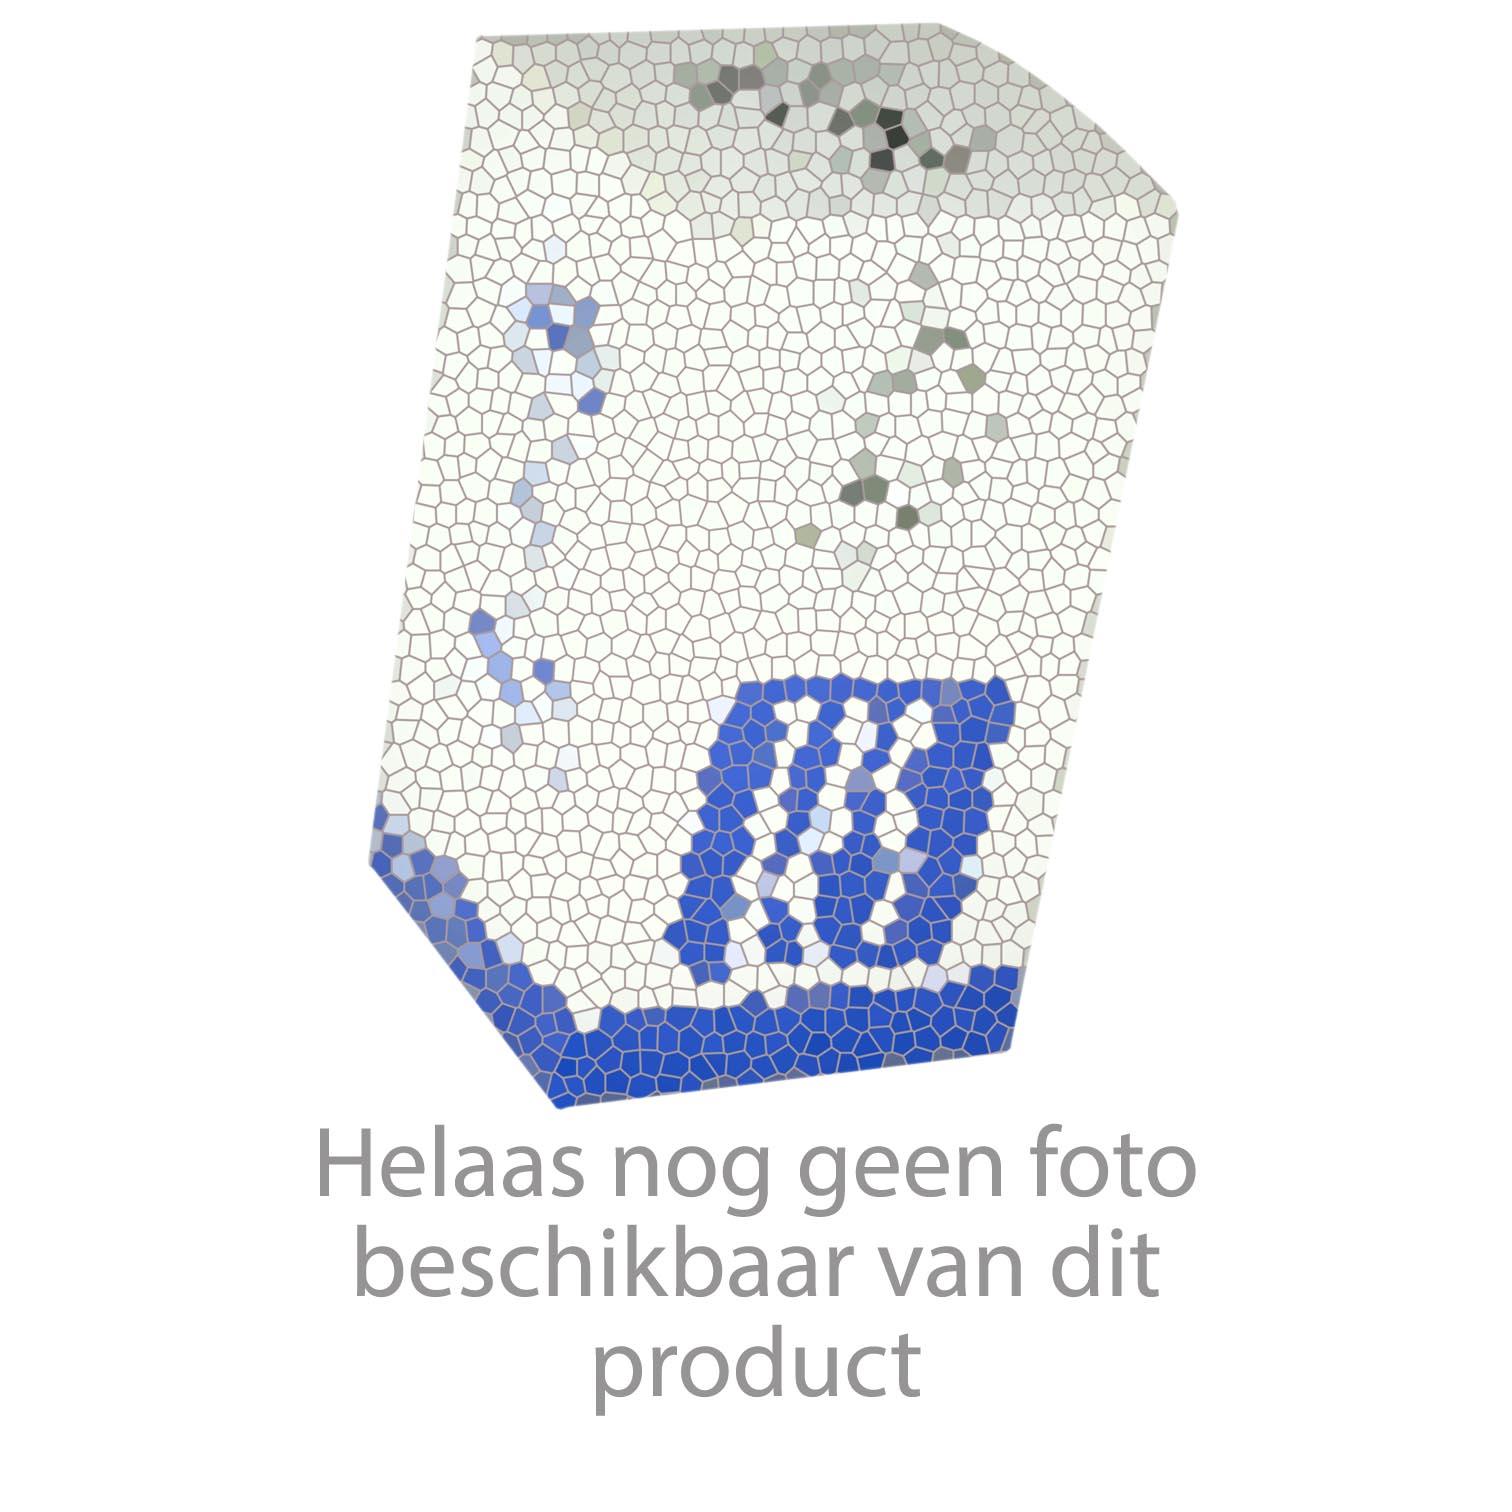 Echtermann Smart CLEAN 1-gats bladmodel tussenkraan op standzuil voor lage bouwhoogte (77cm) Chroom Artikel nummer 6523